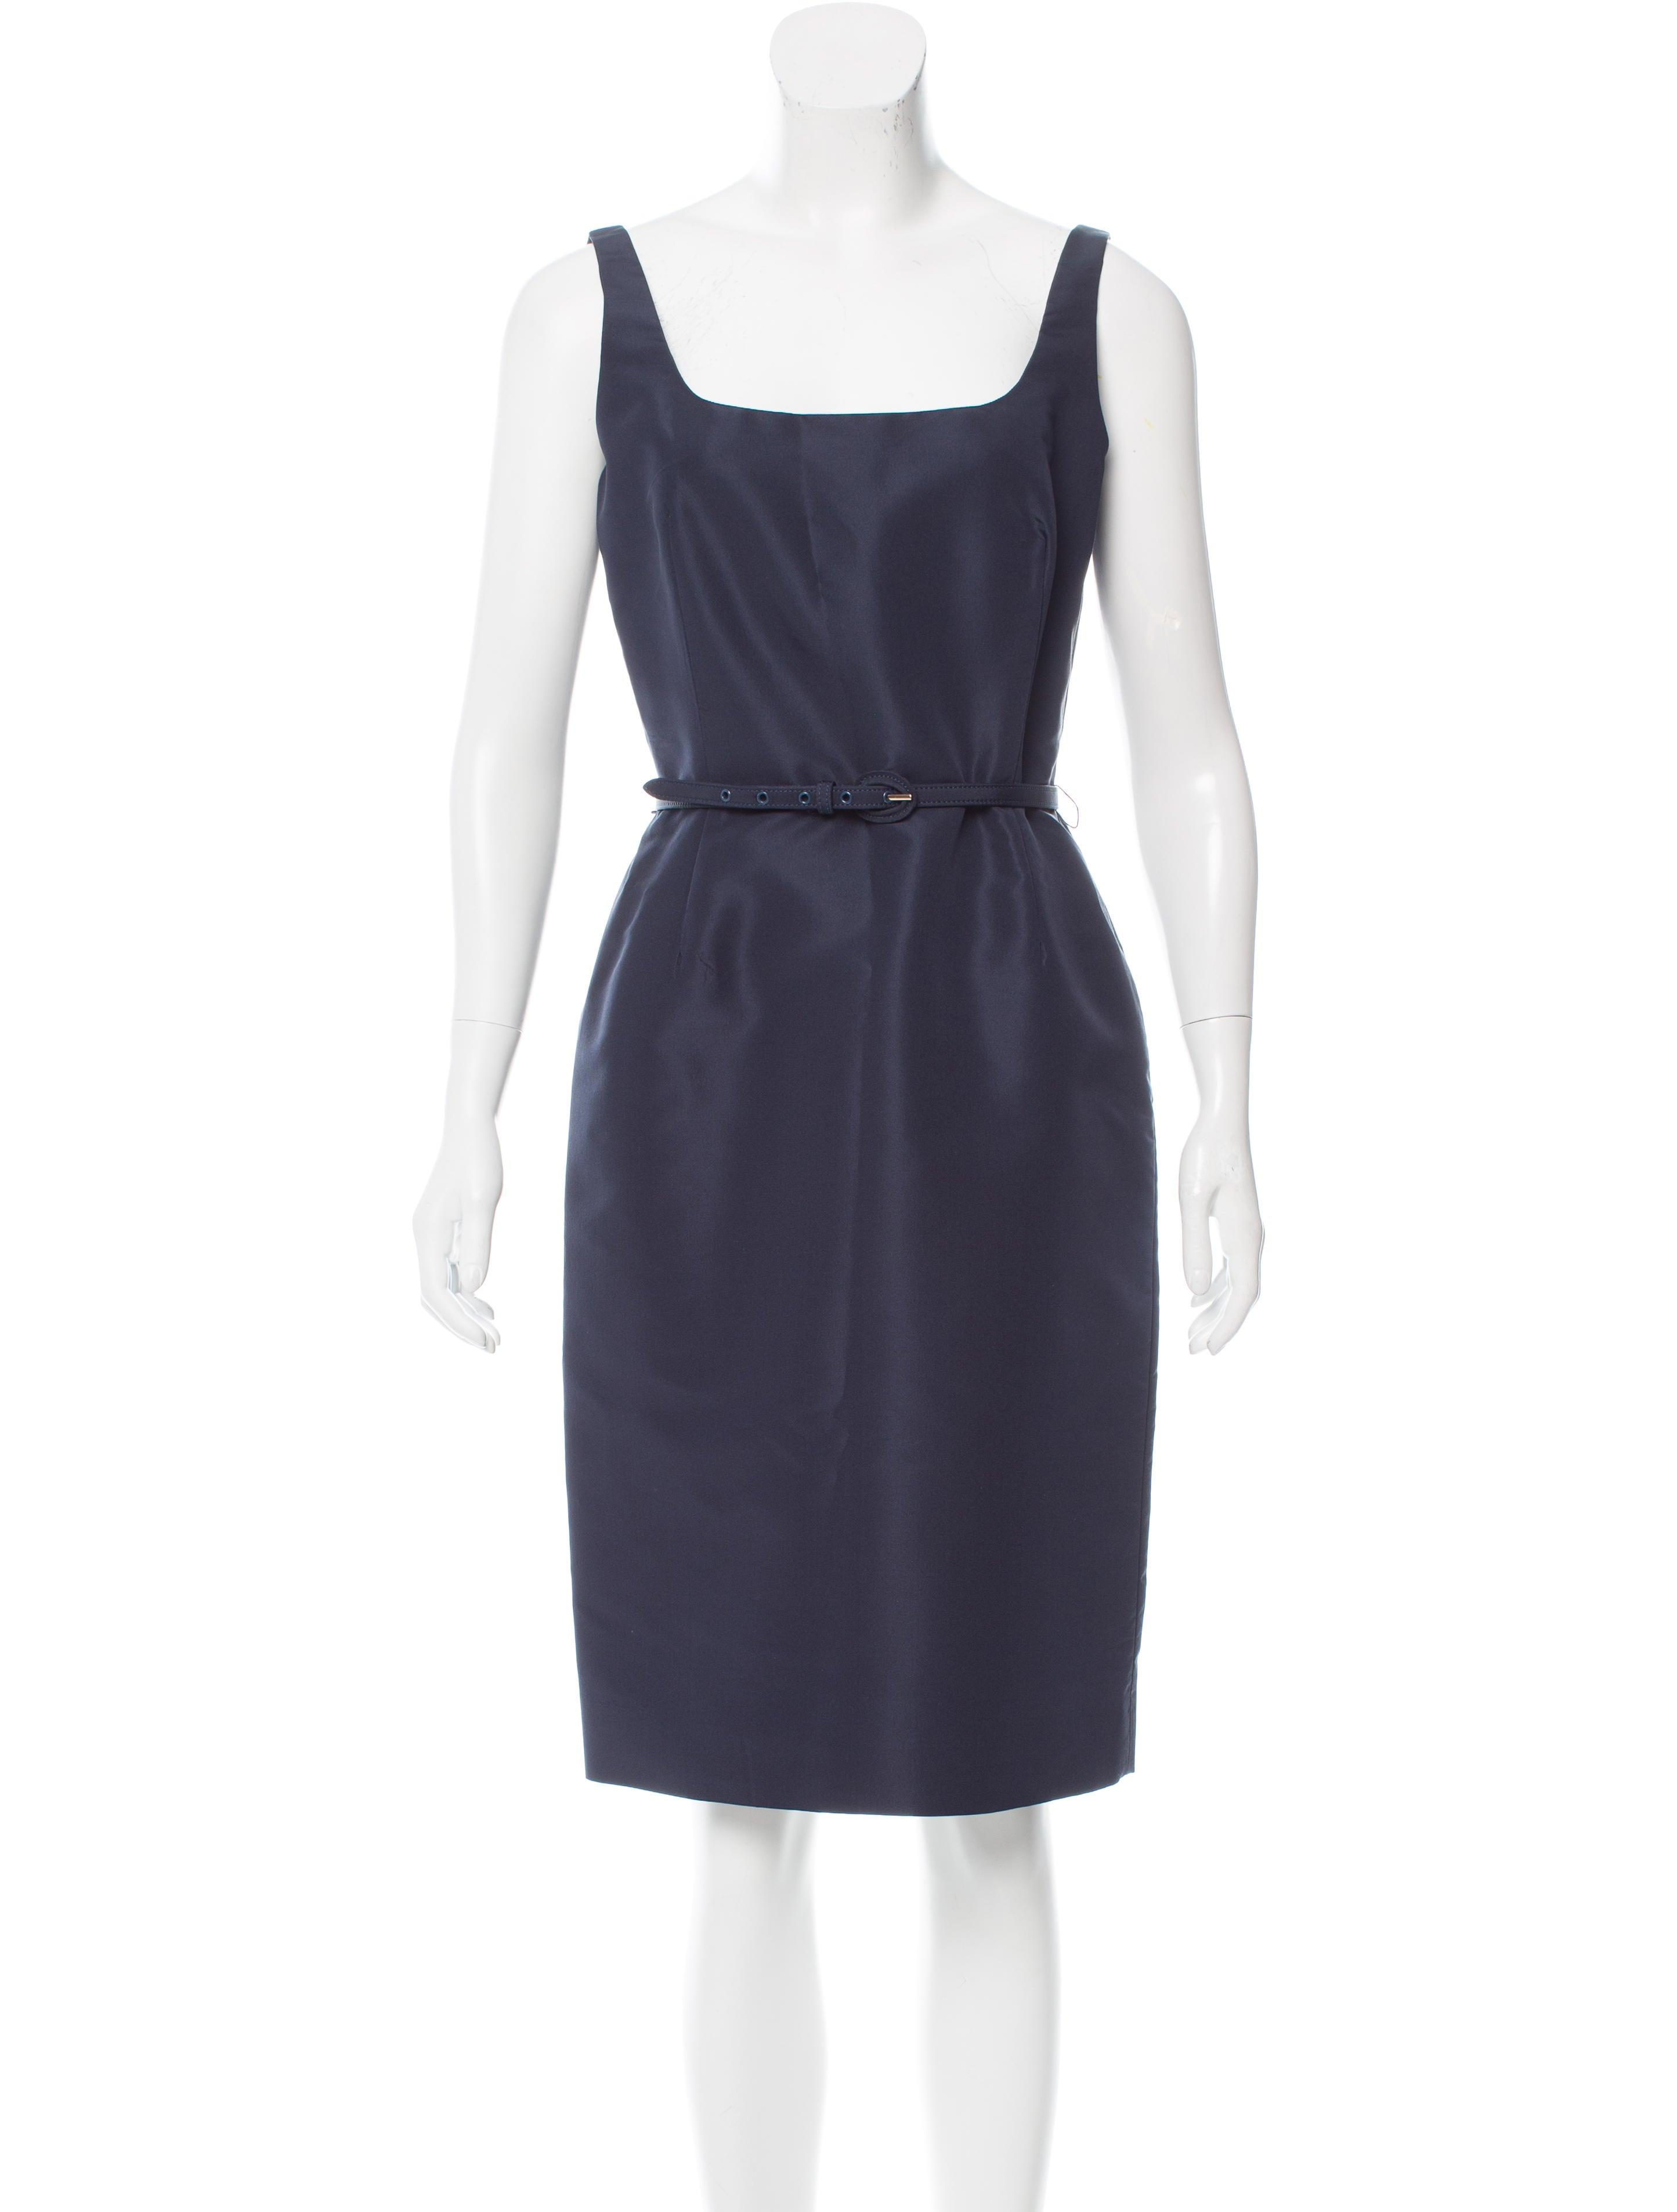 oscar de la renta belted sleeveless dress clothing